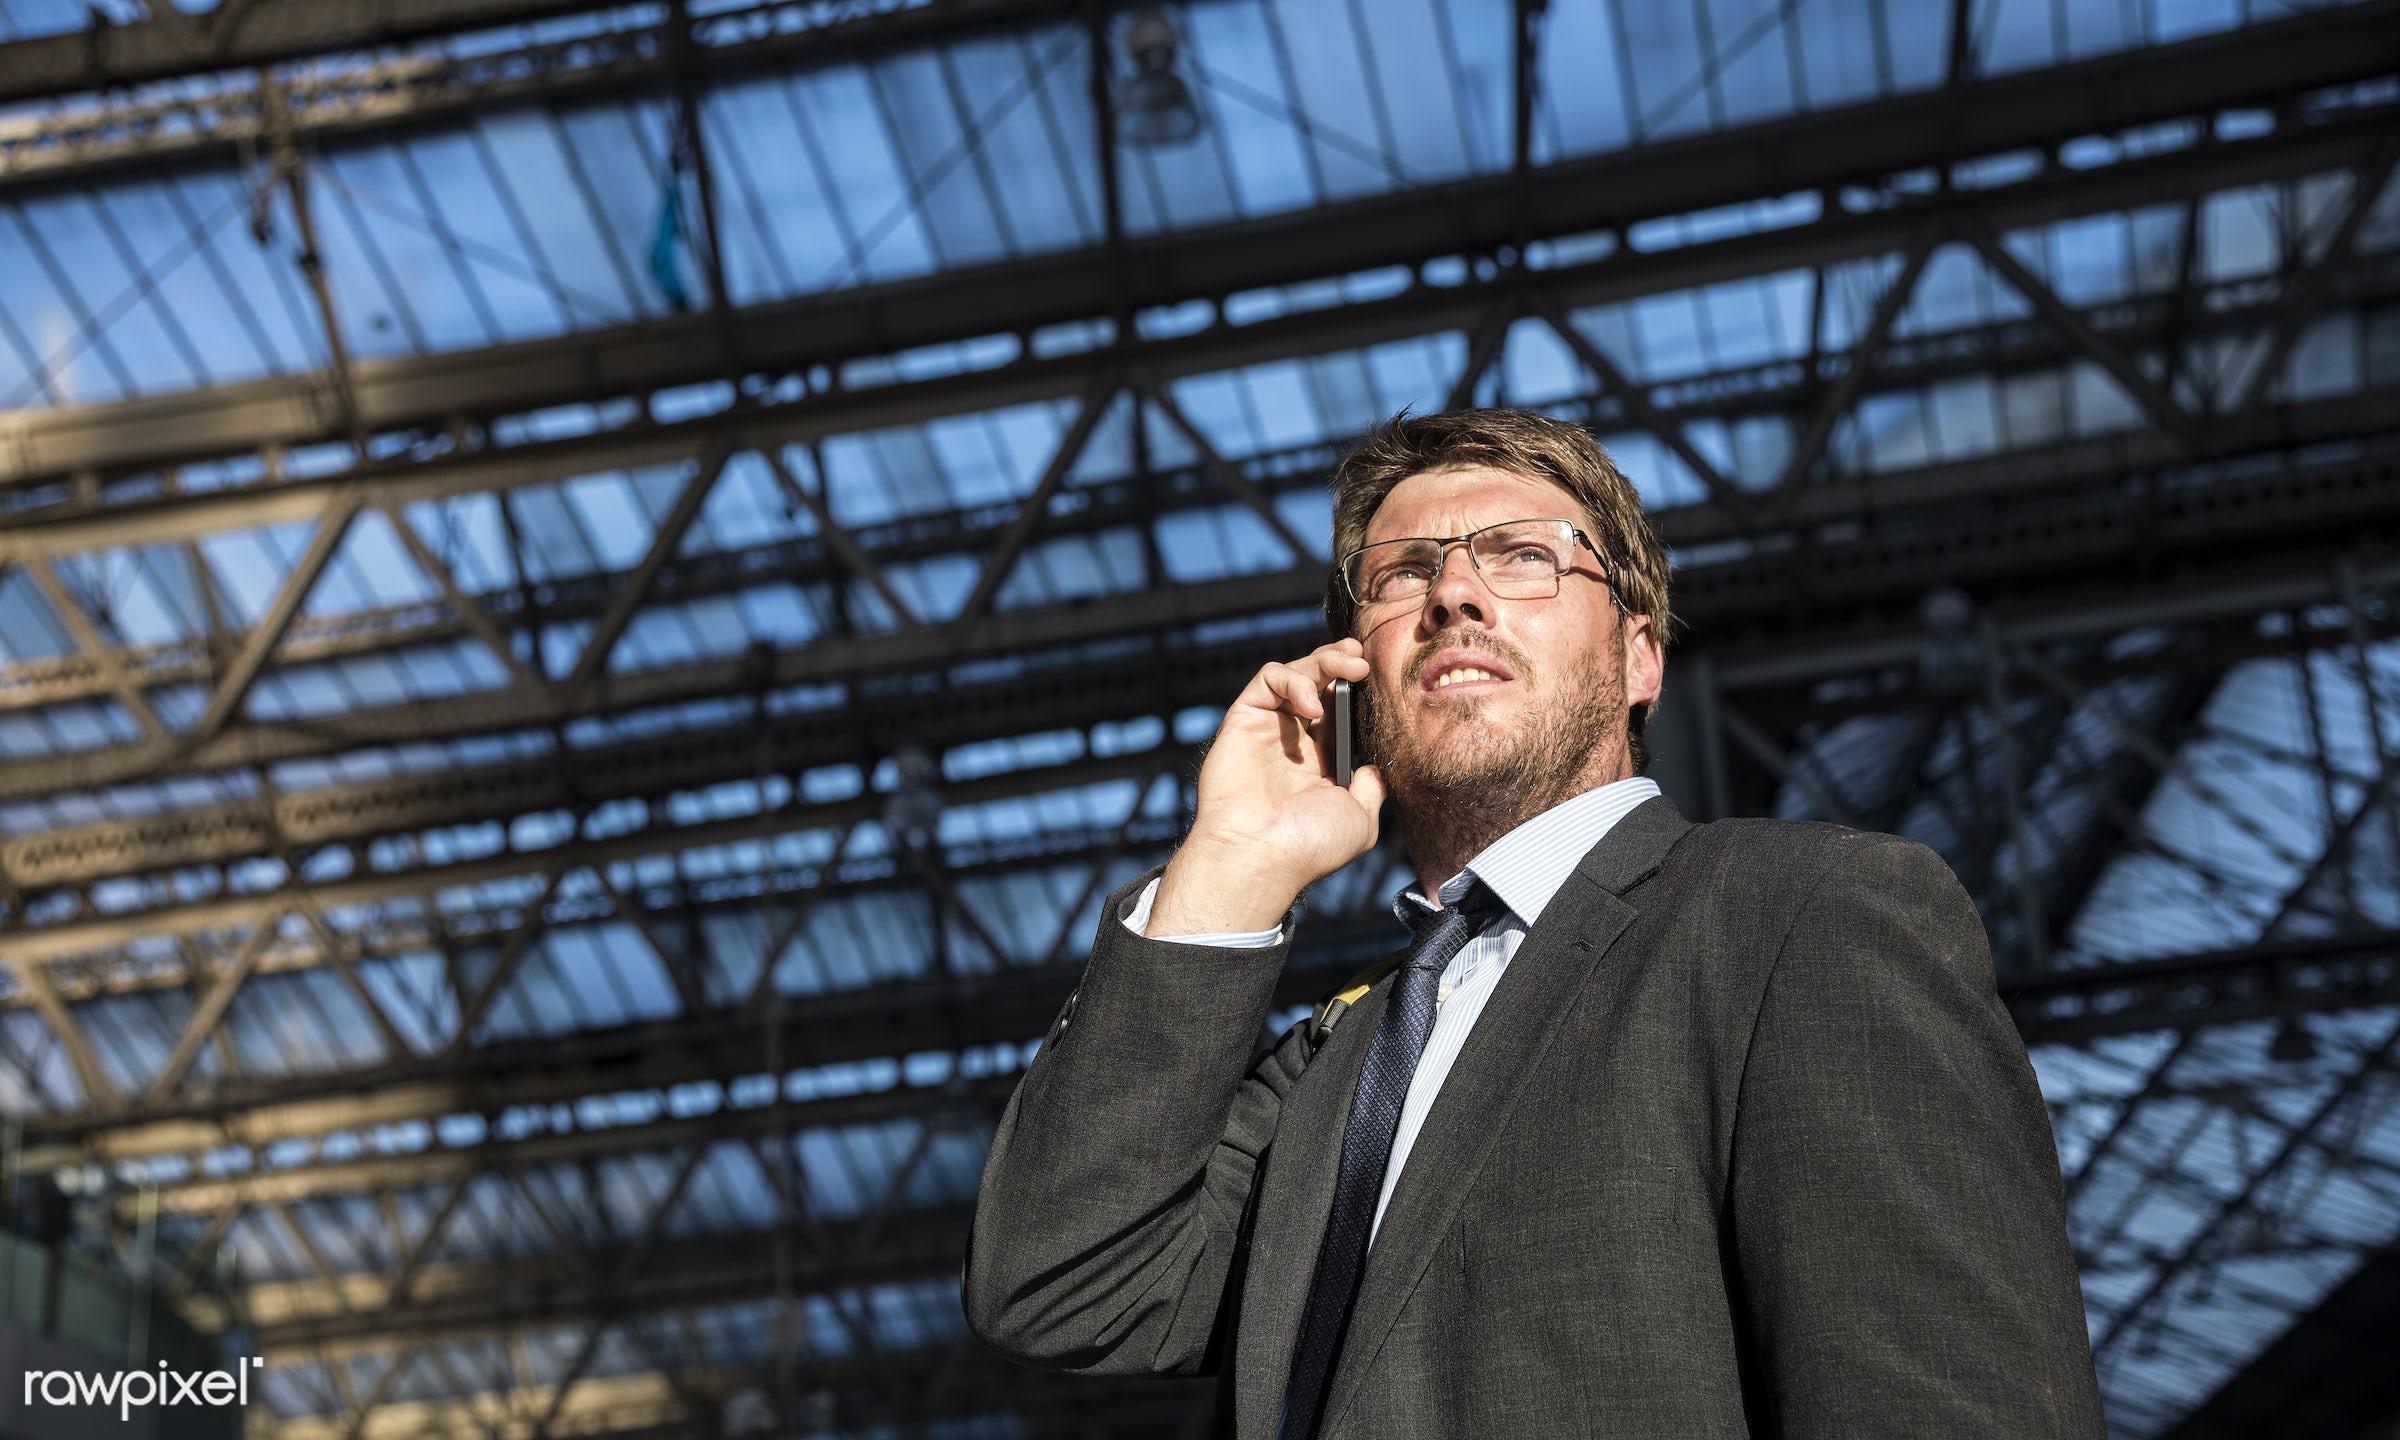 adult, aspirations, business, businessman, call, calling, caucasian, city, communication, confidence, confident, connection...